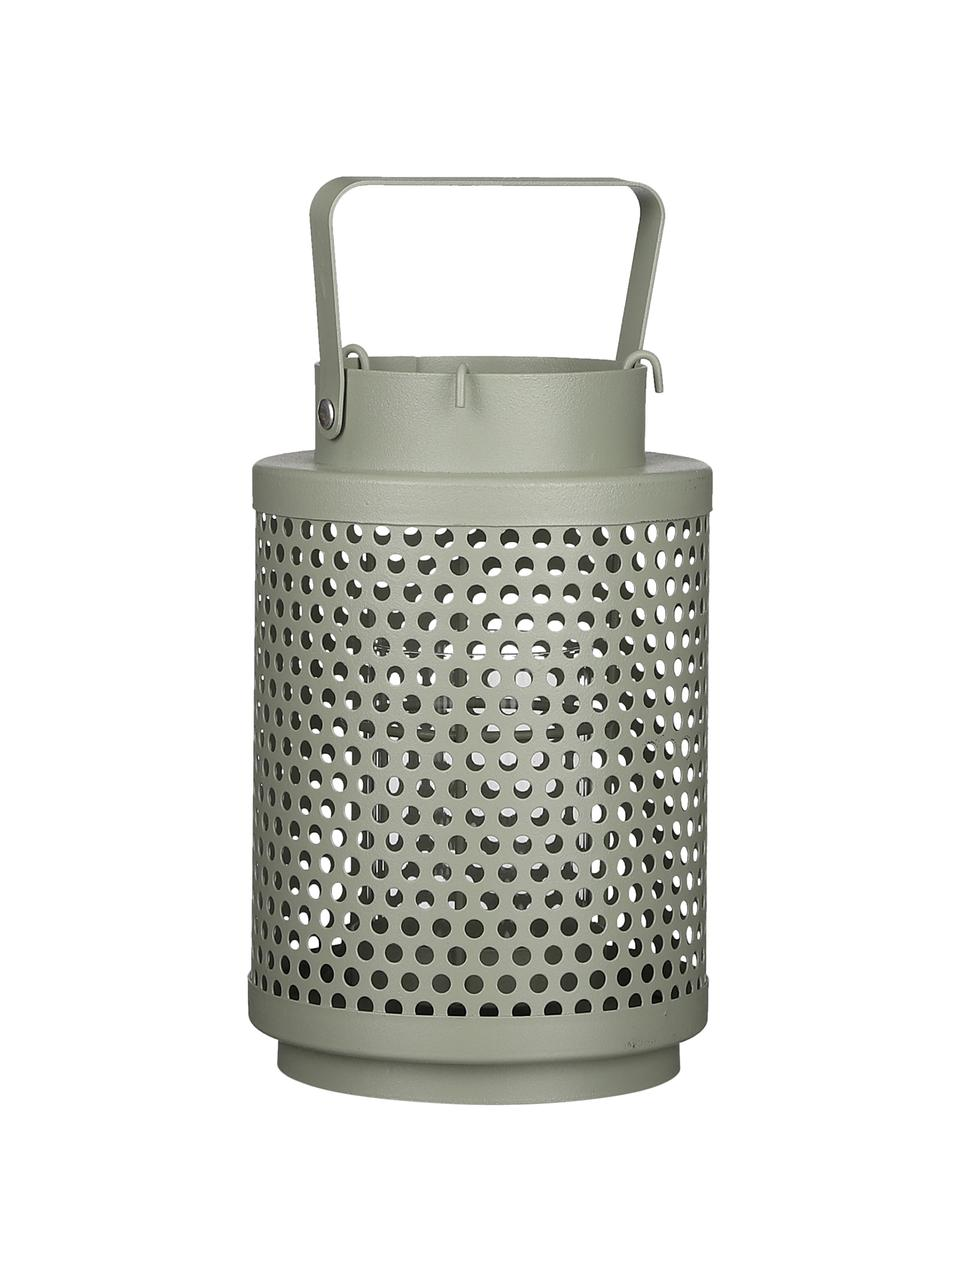 Lanterna Barney, Metallo rivestito, Verde salvia, Ø 12 x Alt. 19 cm